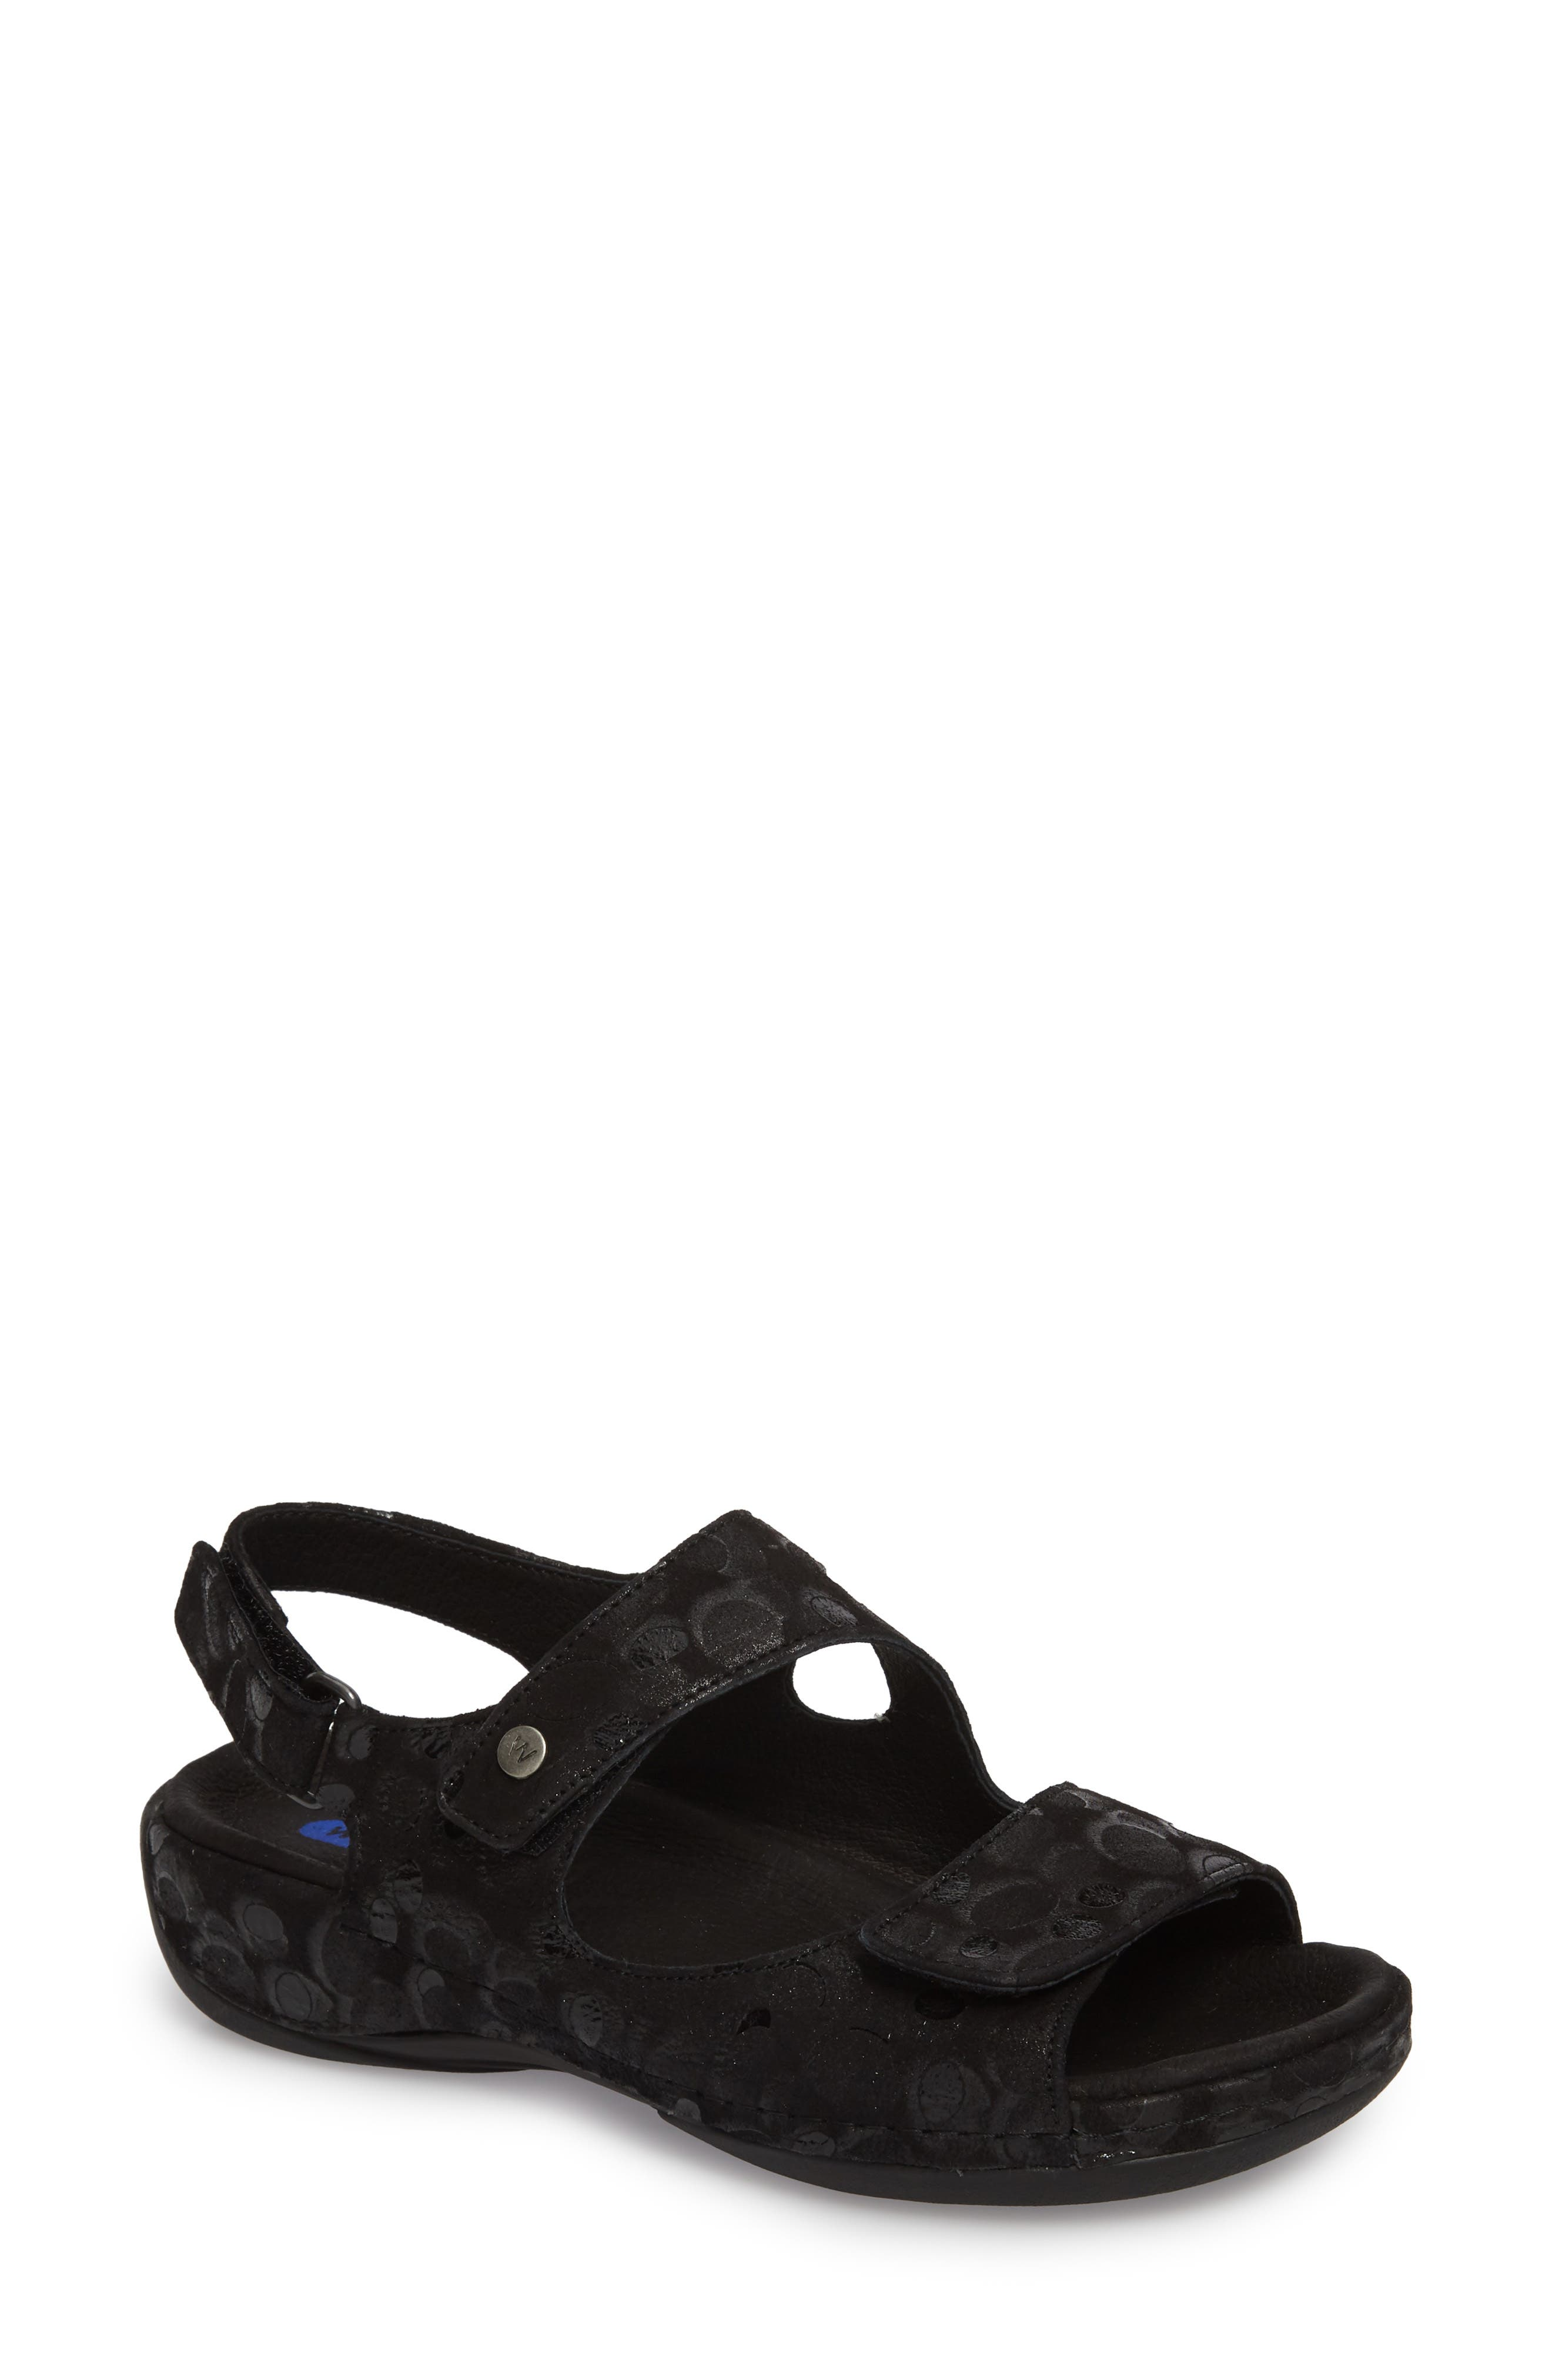 WOLKY Liana Sandal, Main, color, BLACK PRINTED NUBUCK